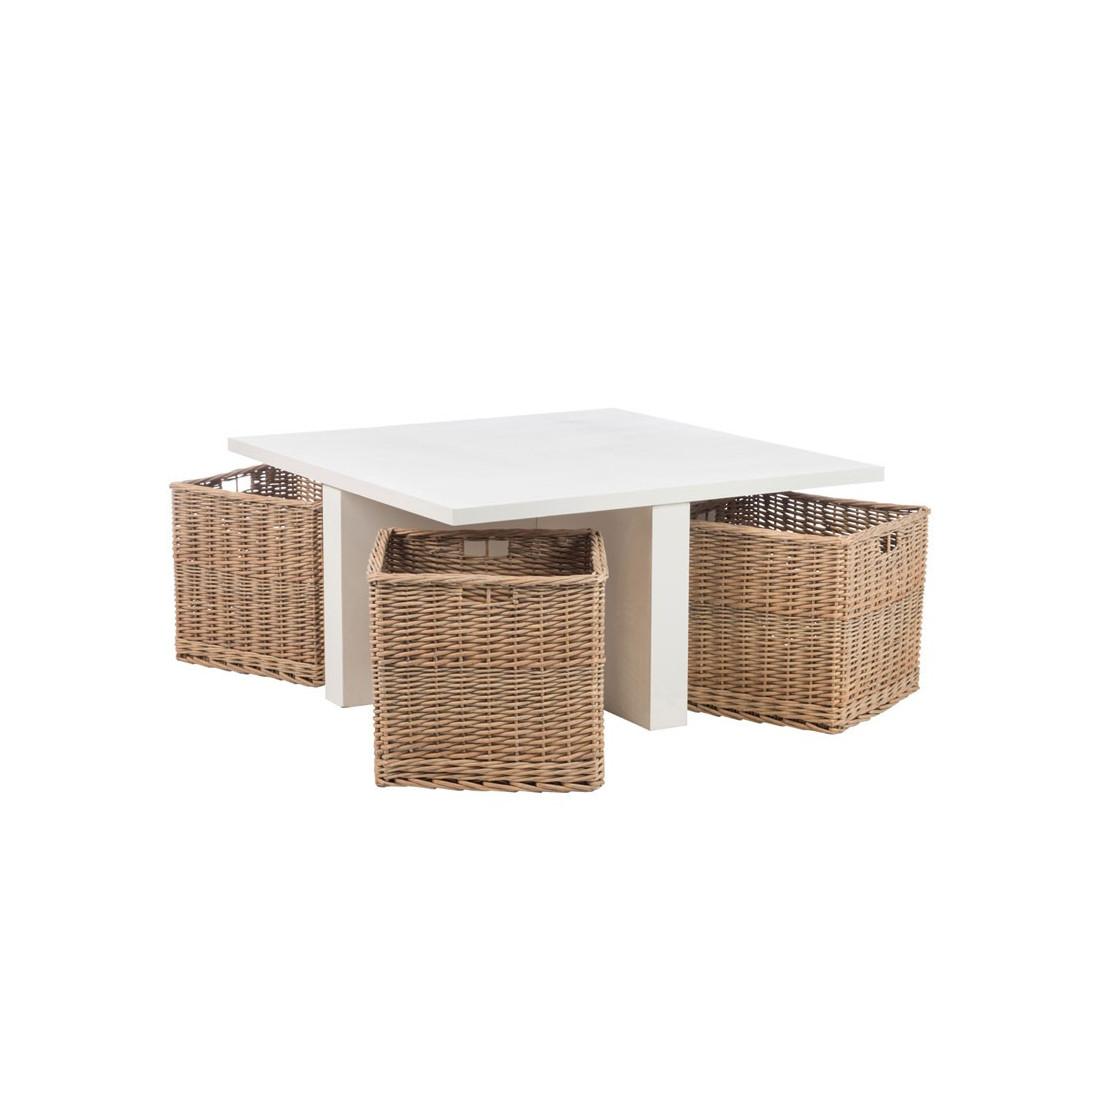 table basse avec 4 paniers en osier marin univers du salon. Black Bedroom Furniture Sets. Home Design Ideas